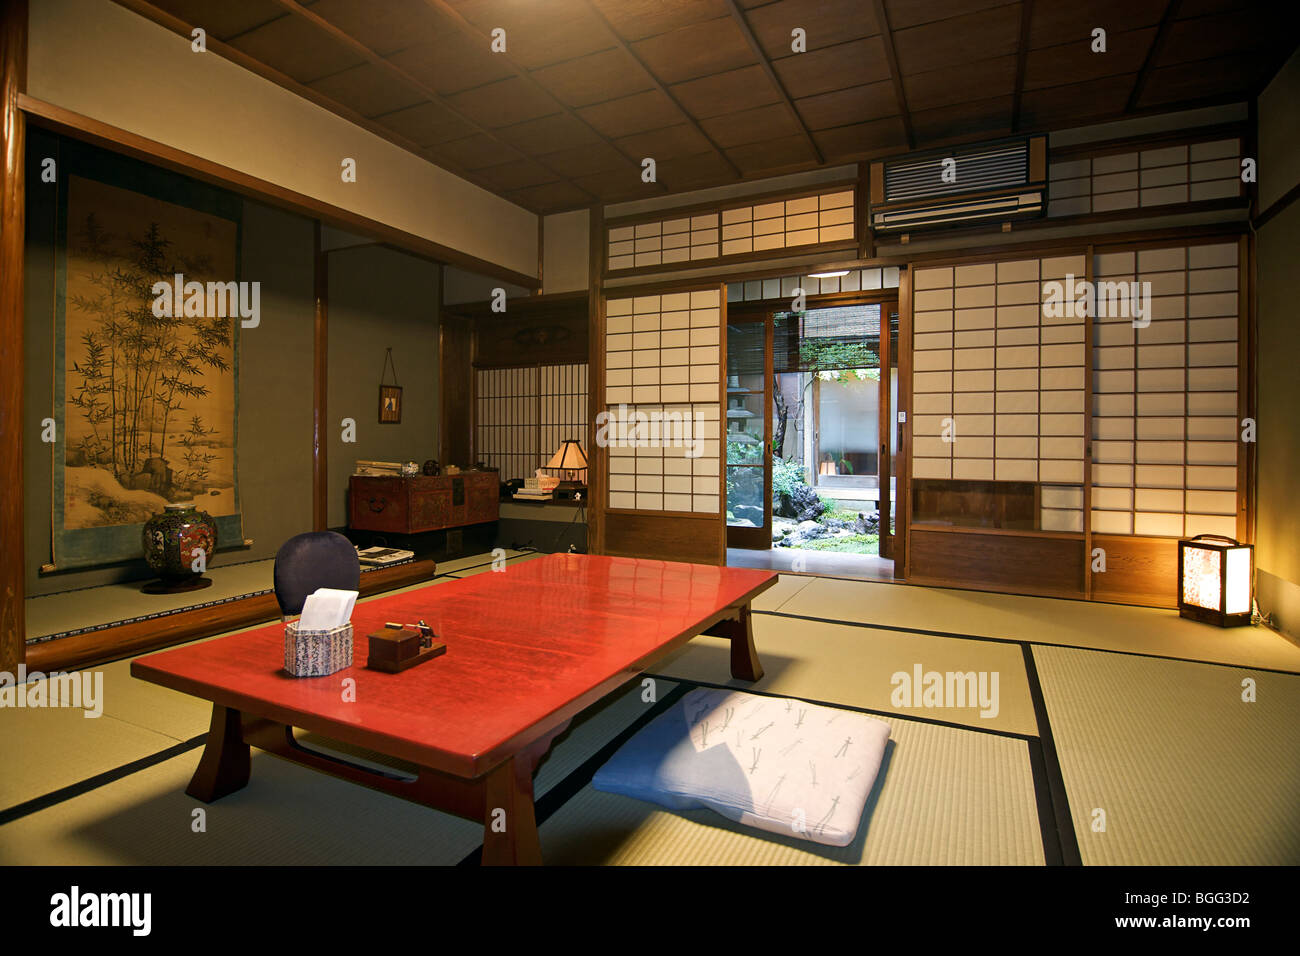 Ishihara ryokan Kyoto Japan Traditional Japanese style guest